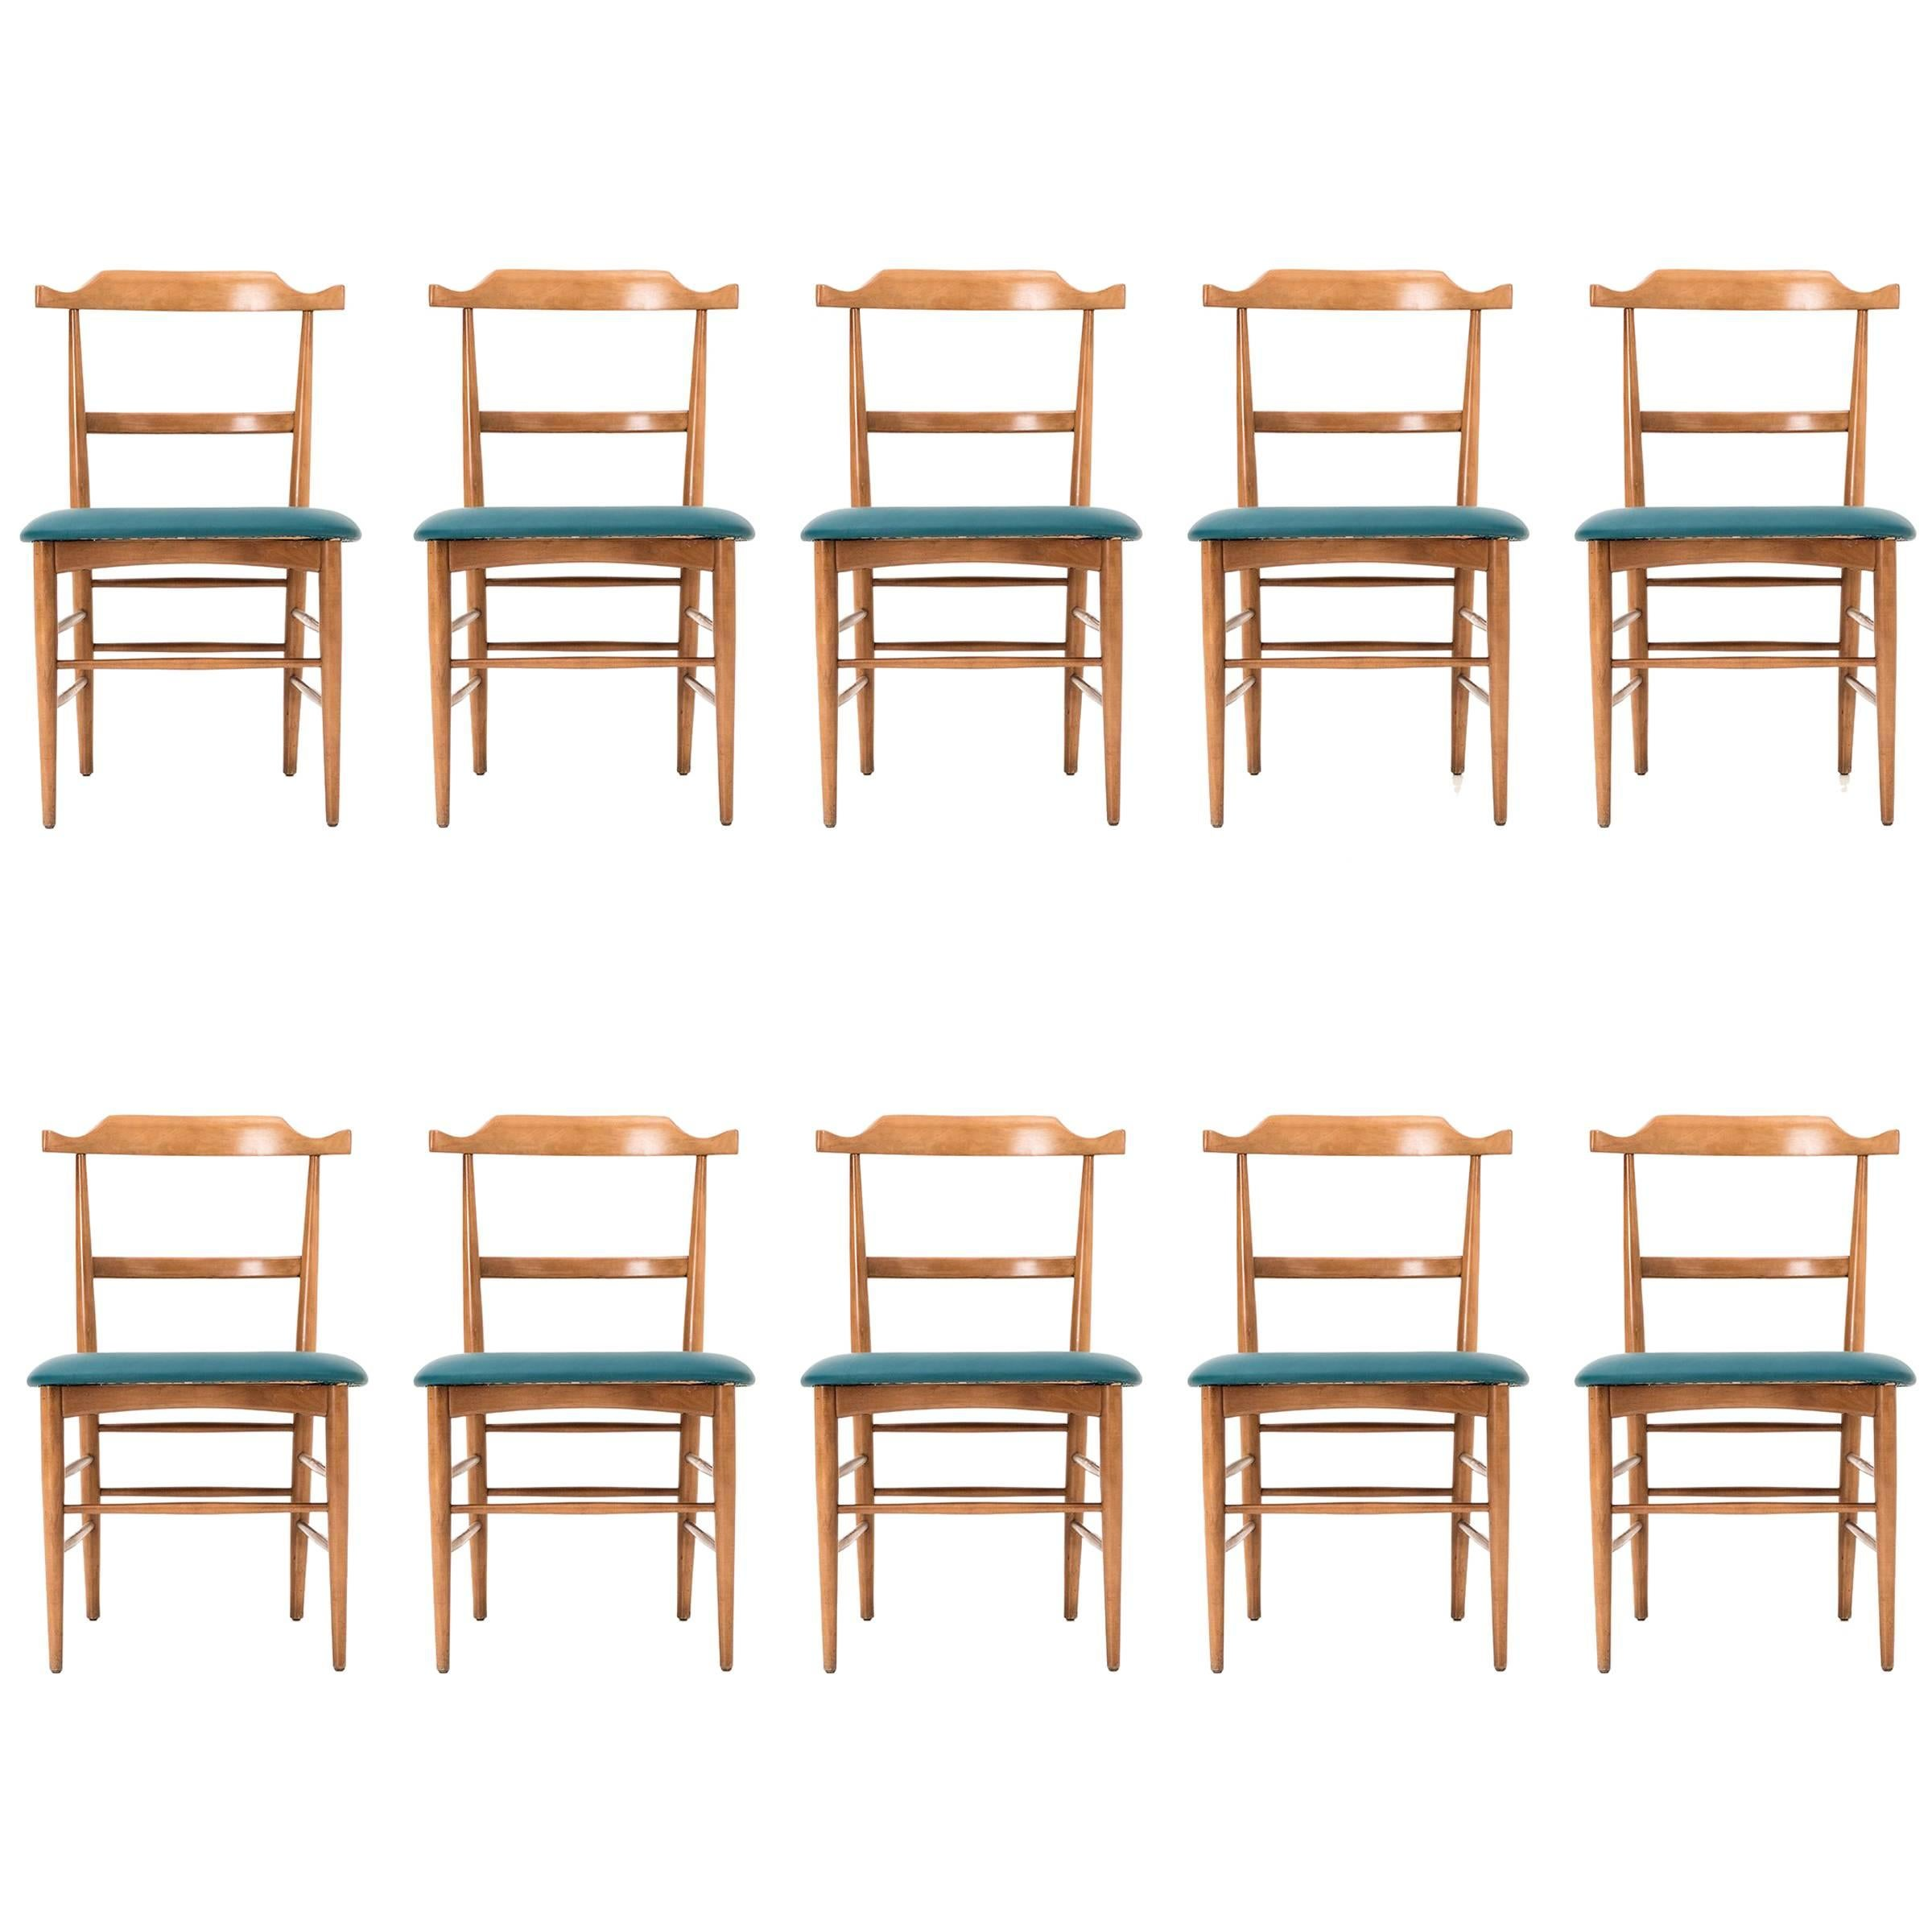 Set of Ten Milo Baughman Dining Chairs